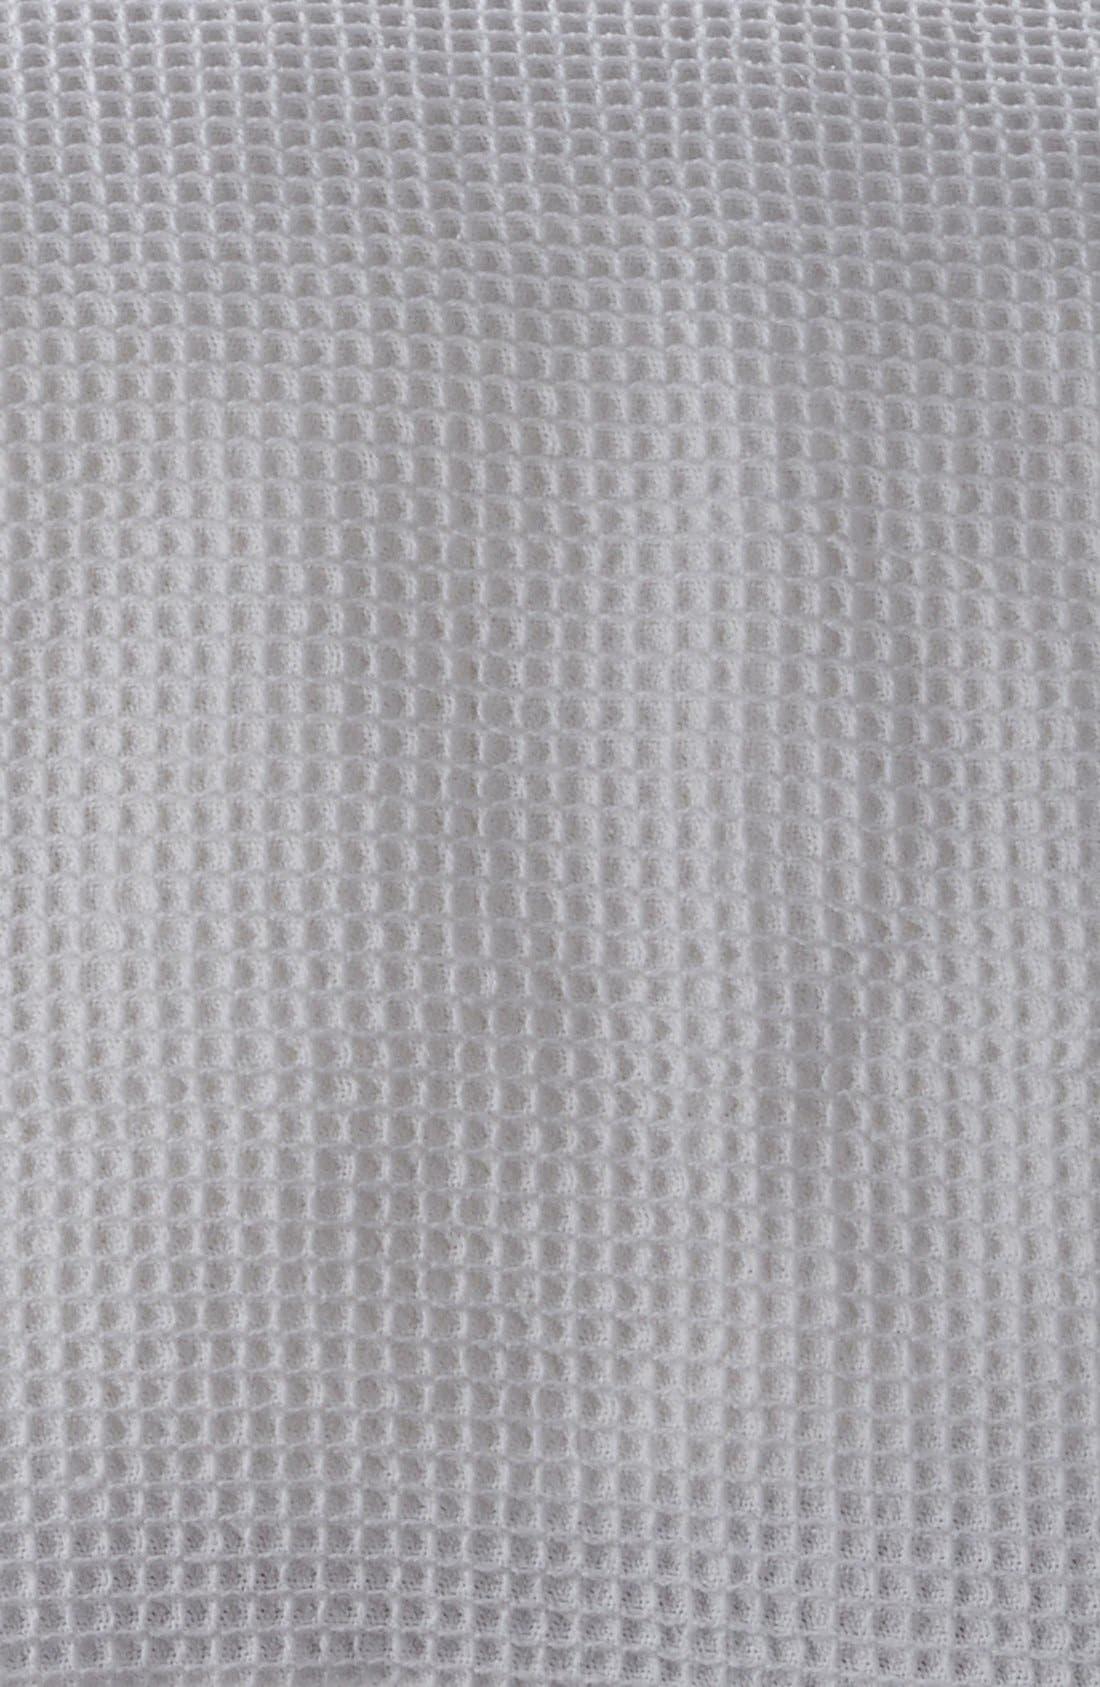 'Hudson' Waffle Knit Blanket,                             Alternate thumbnail 2, color,                             100